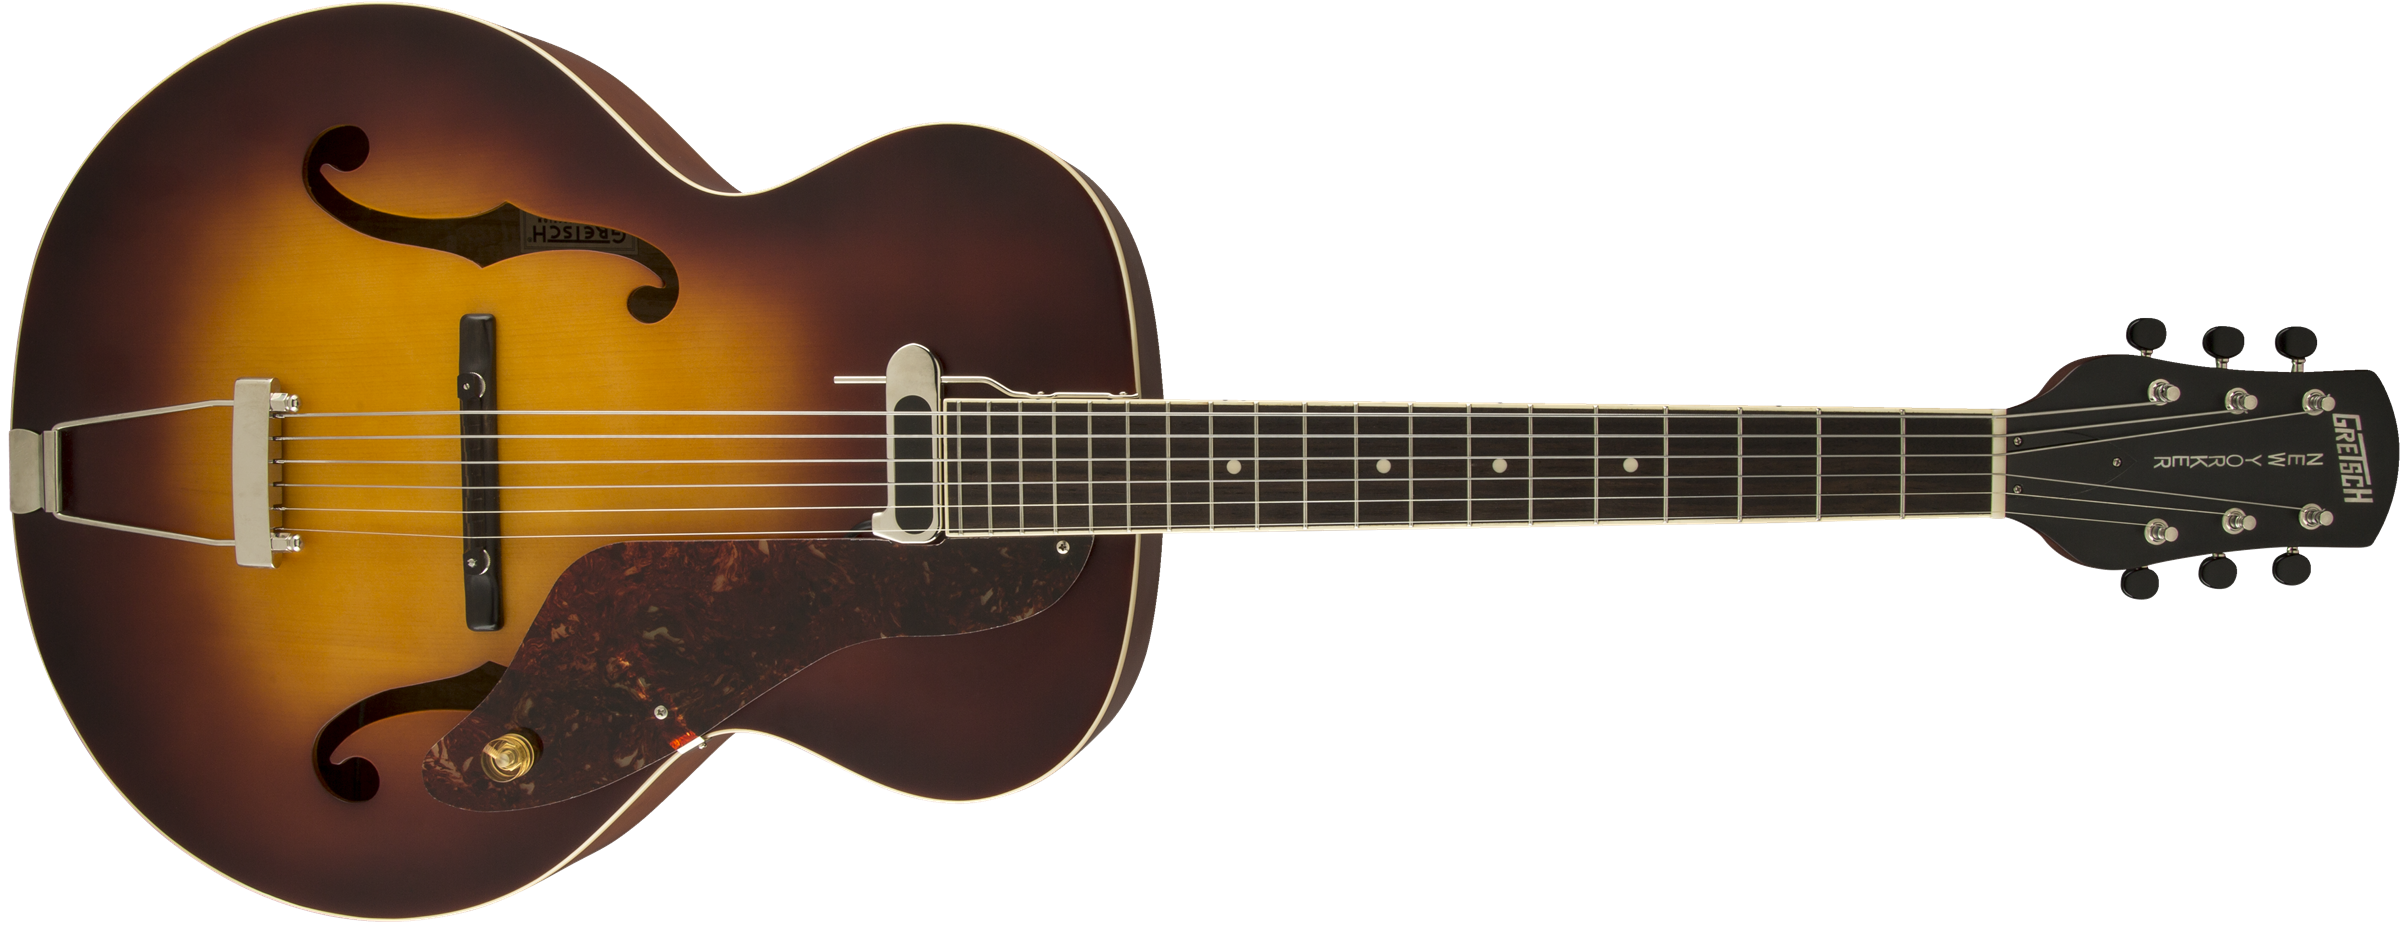 folk bluegrass g9555 new yorker archtop guitar with pickup semi gloss vintage sunburst. Black Bedroom Furniture Sets. Home Design Ideas